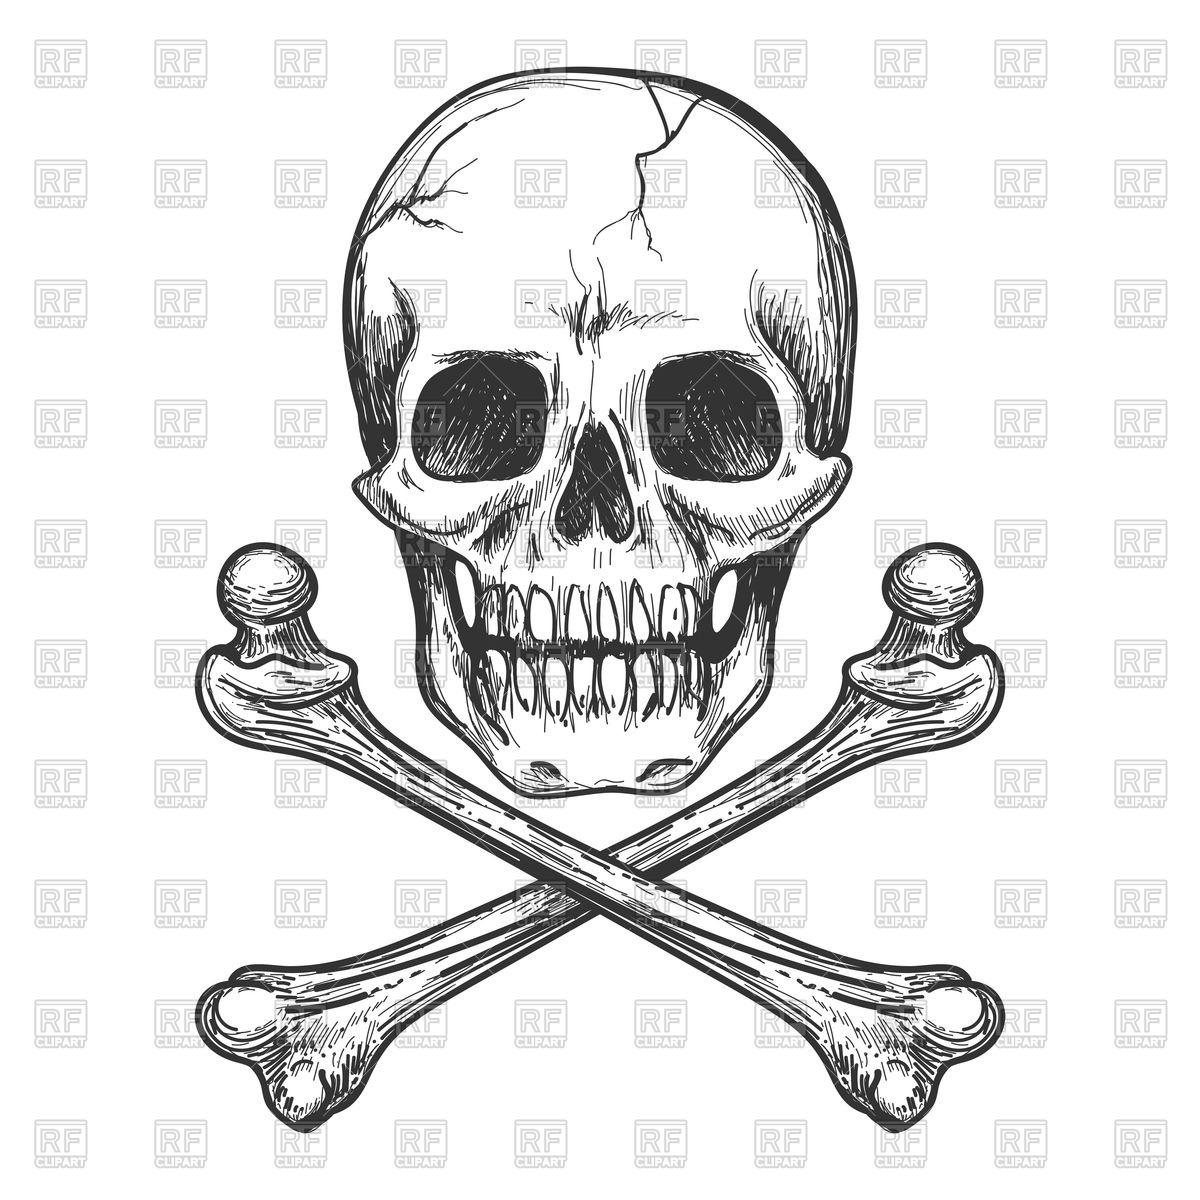 1200x1200 Skull And Crossbones For Tattoo Vector Image Vector Artwork Of